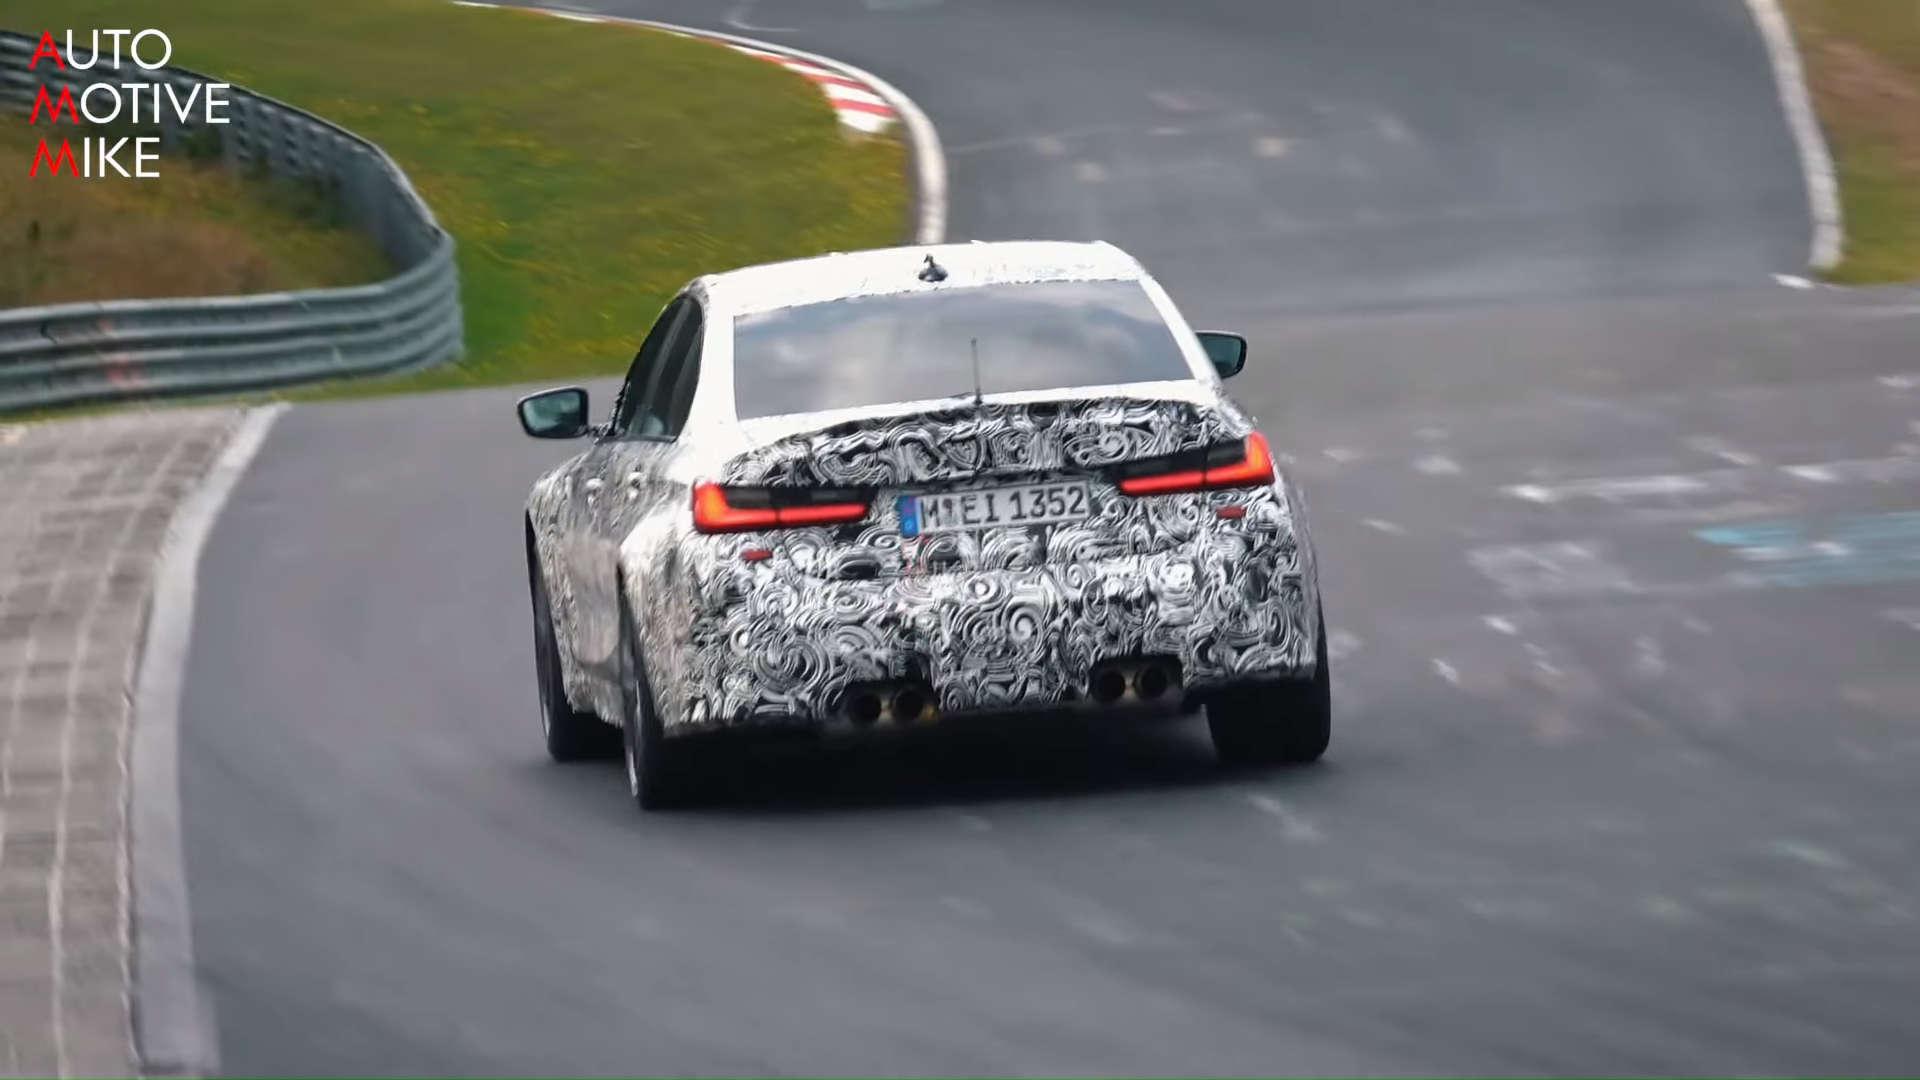 2021 BMW G80 M3 Nurburgring Nordschleife Spy Shots Rear